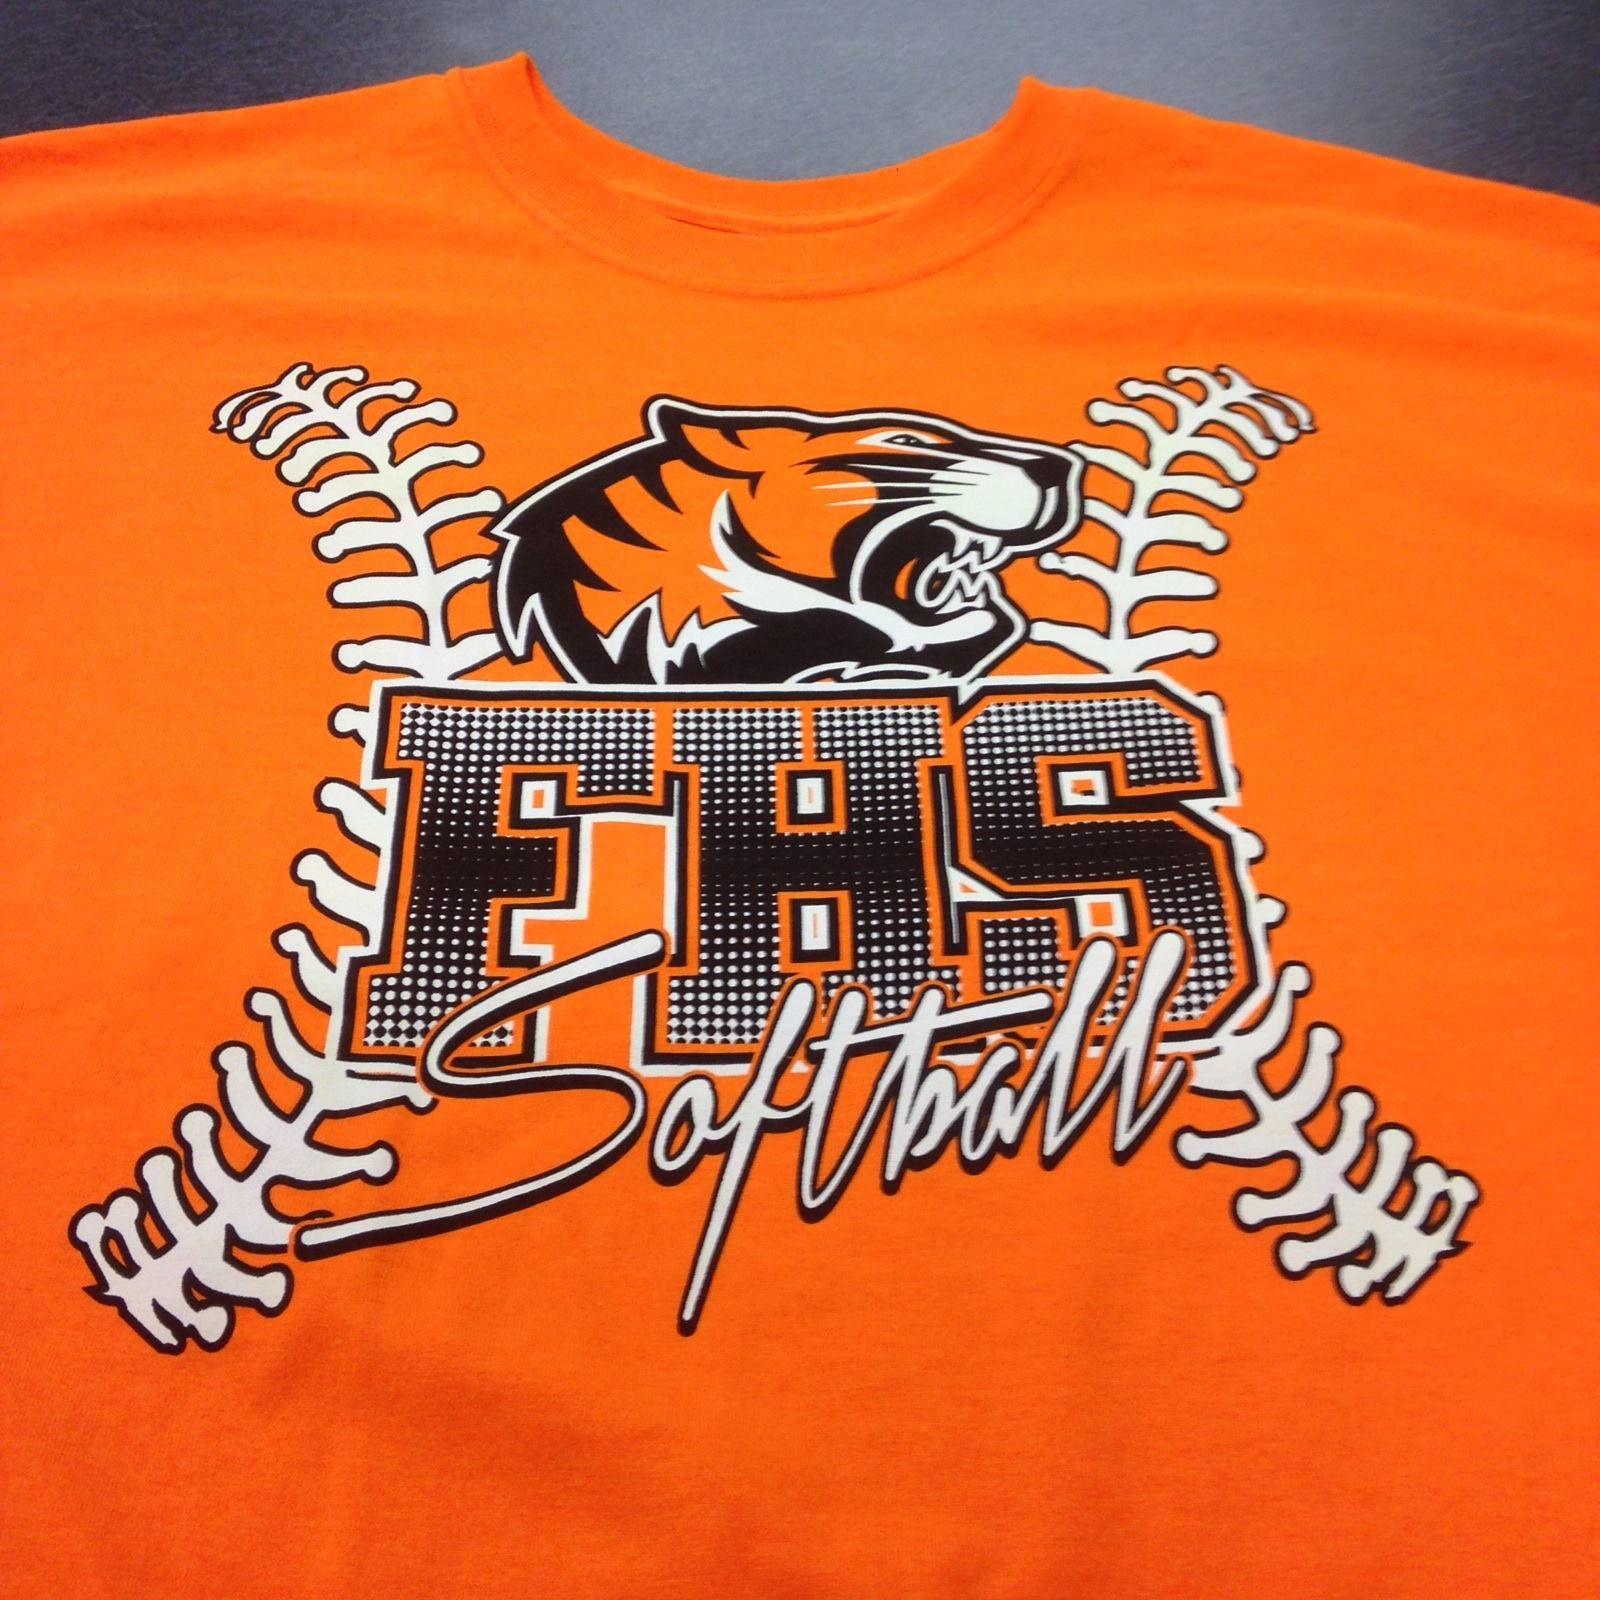 Softball t-shirts #fayettevillehigh #tennessee | Baseball t ...